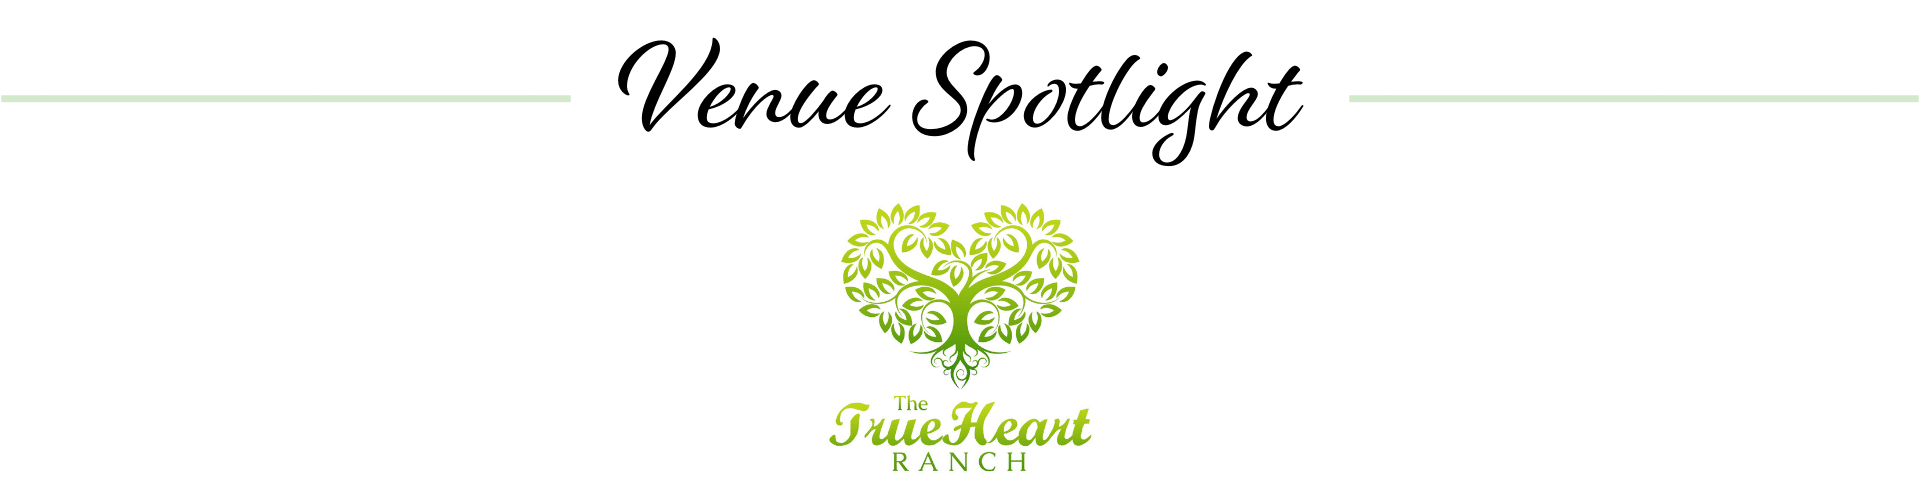 TrueHeart Ranch logo